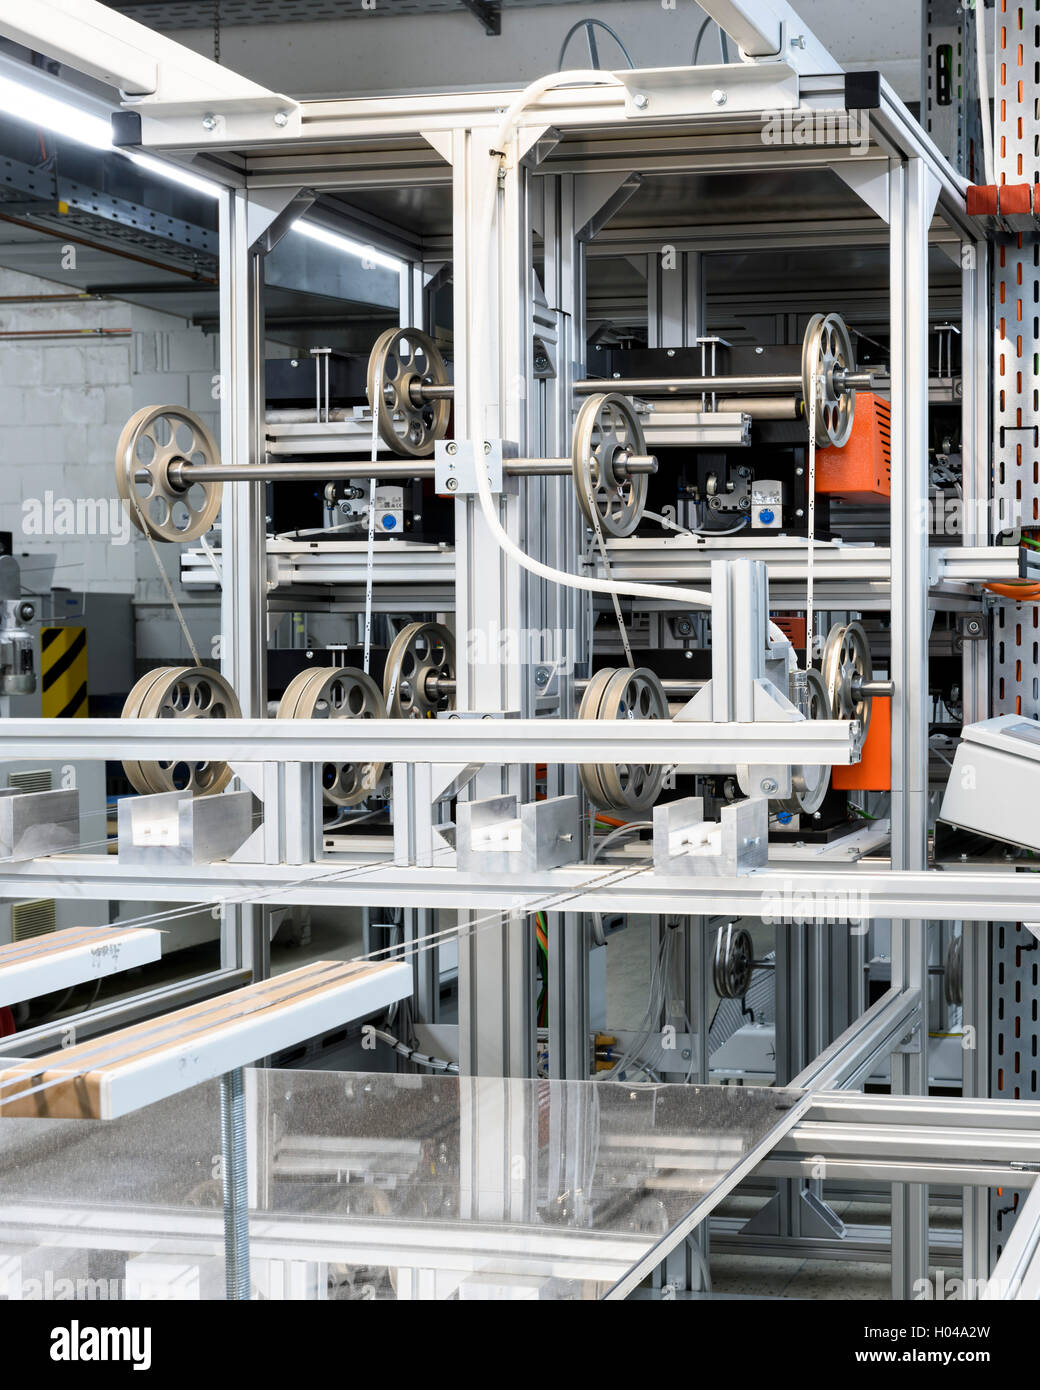 Steel ribbon on the production line. Harry's Razor Blade Factory, Eisfeld, Germany. Architect: -, 1920. Stock Photo